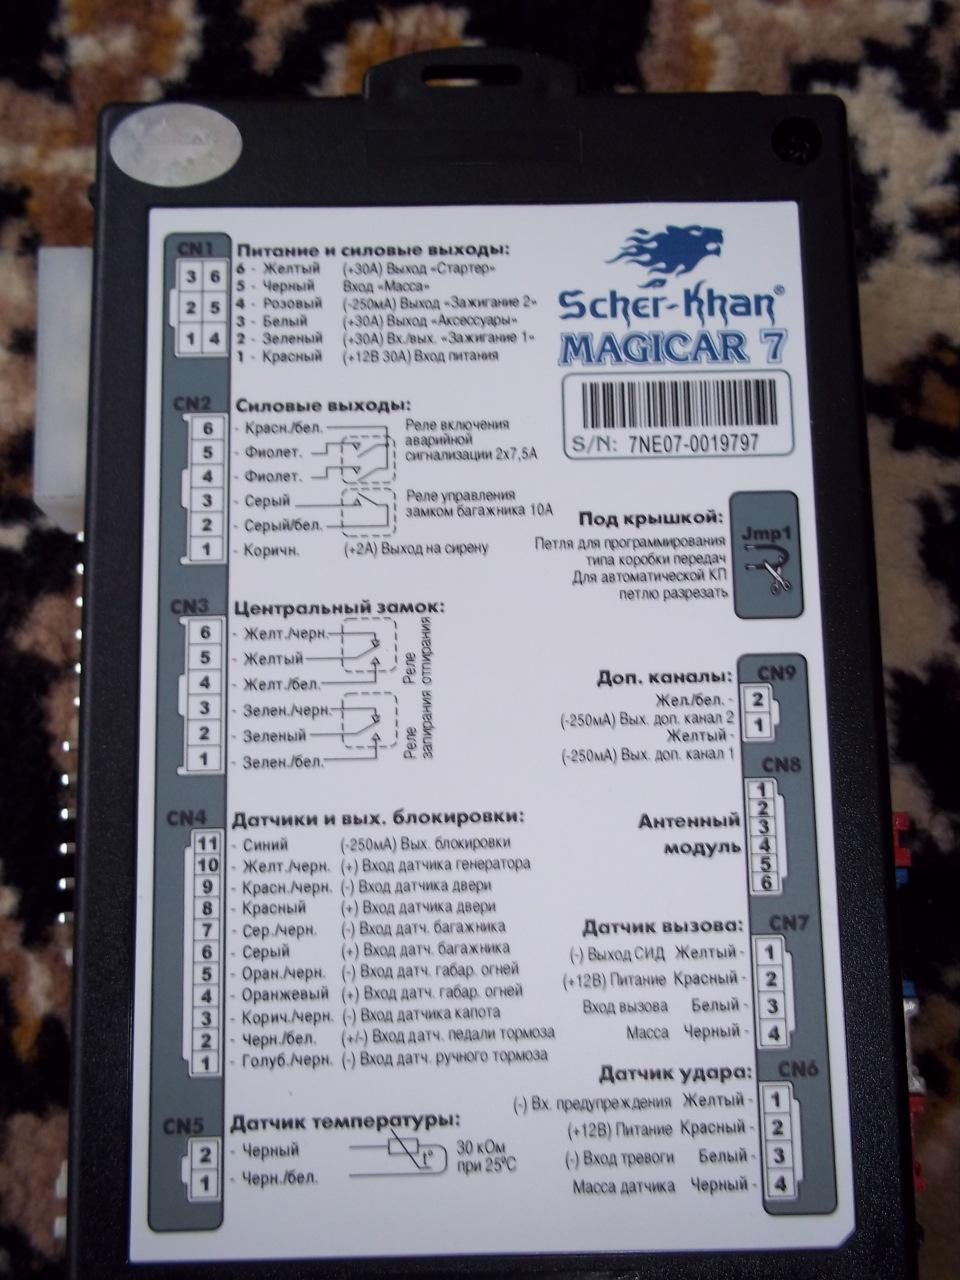 Инструкция по эксплуатации сигнализации scher khan magicar 7